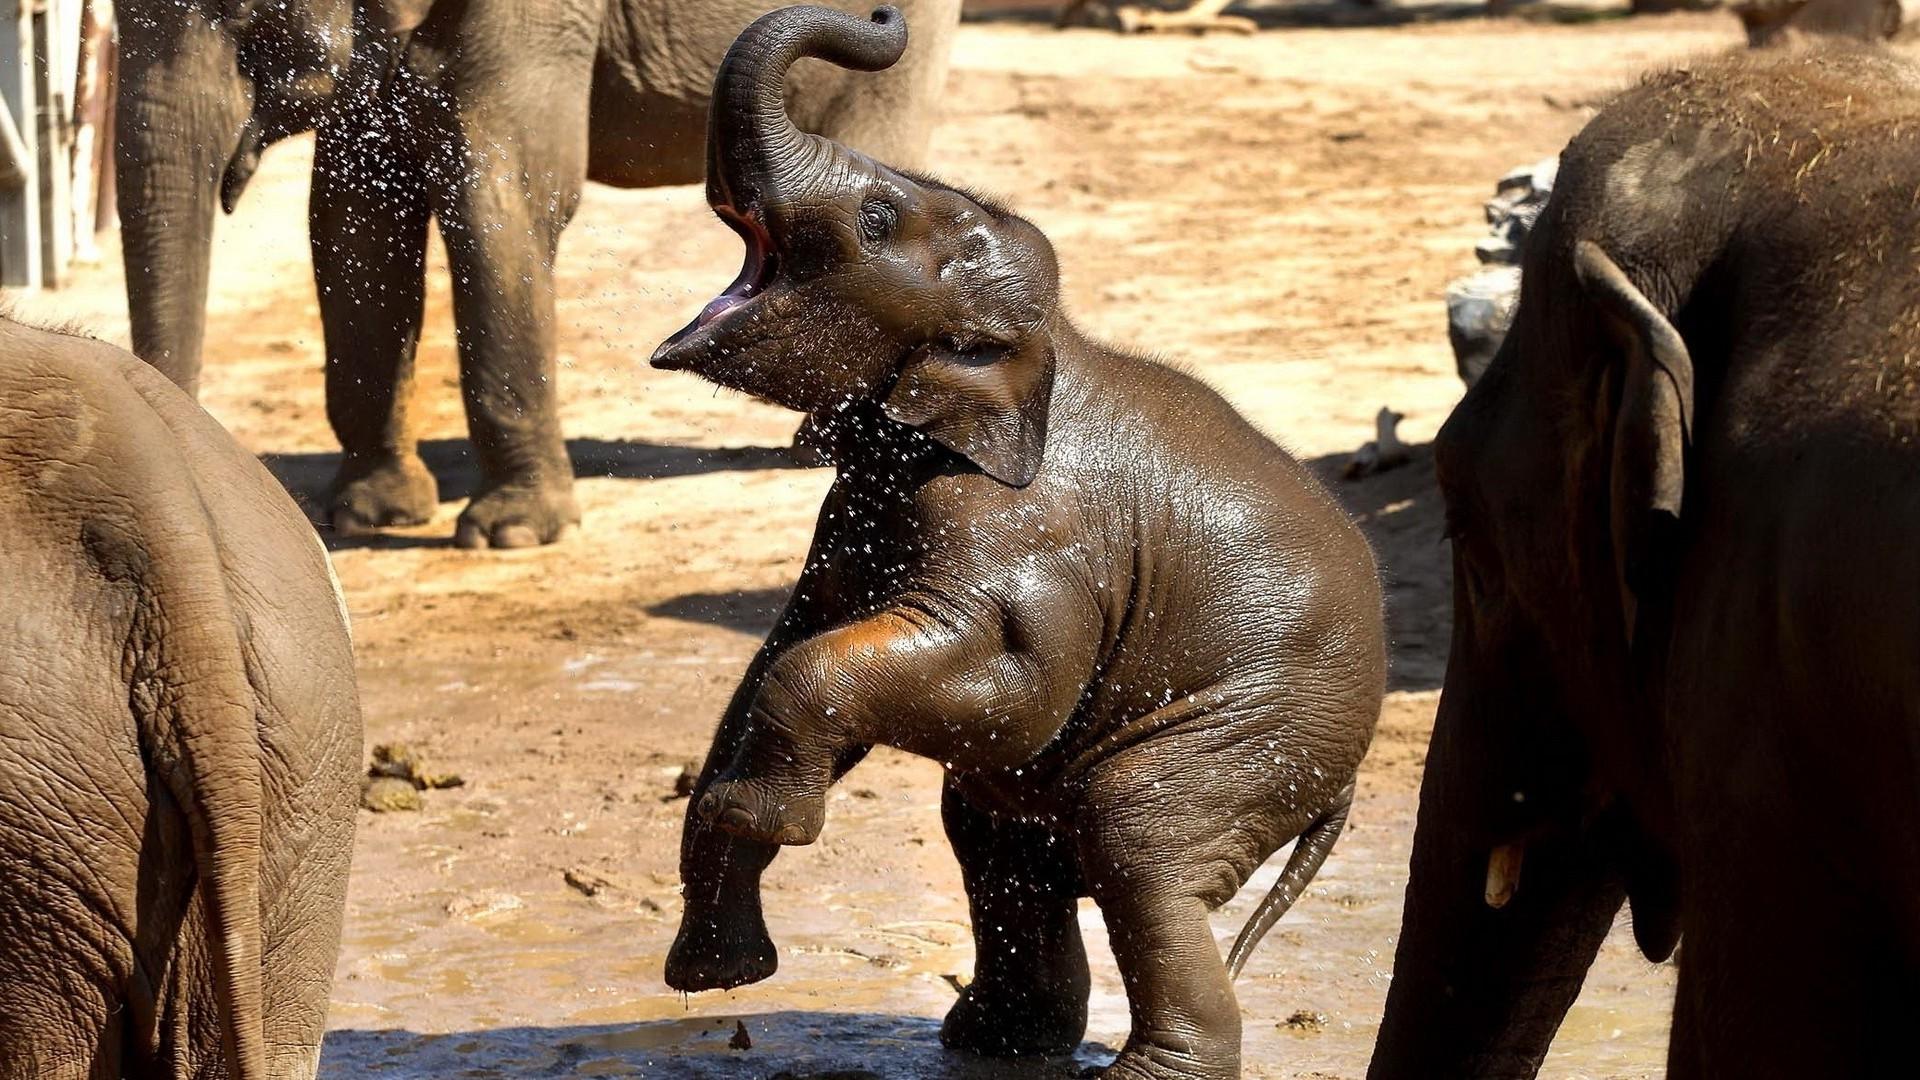 Baby elephants wallpaper - photo#55